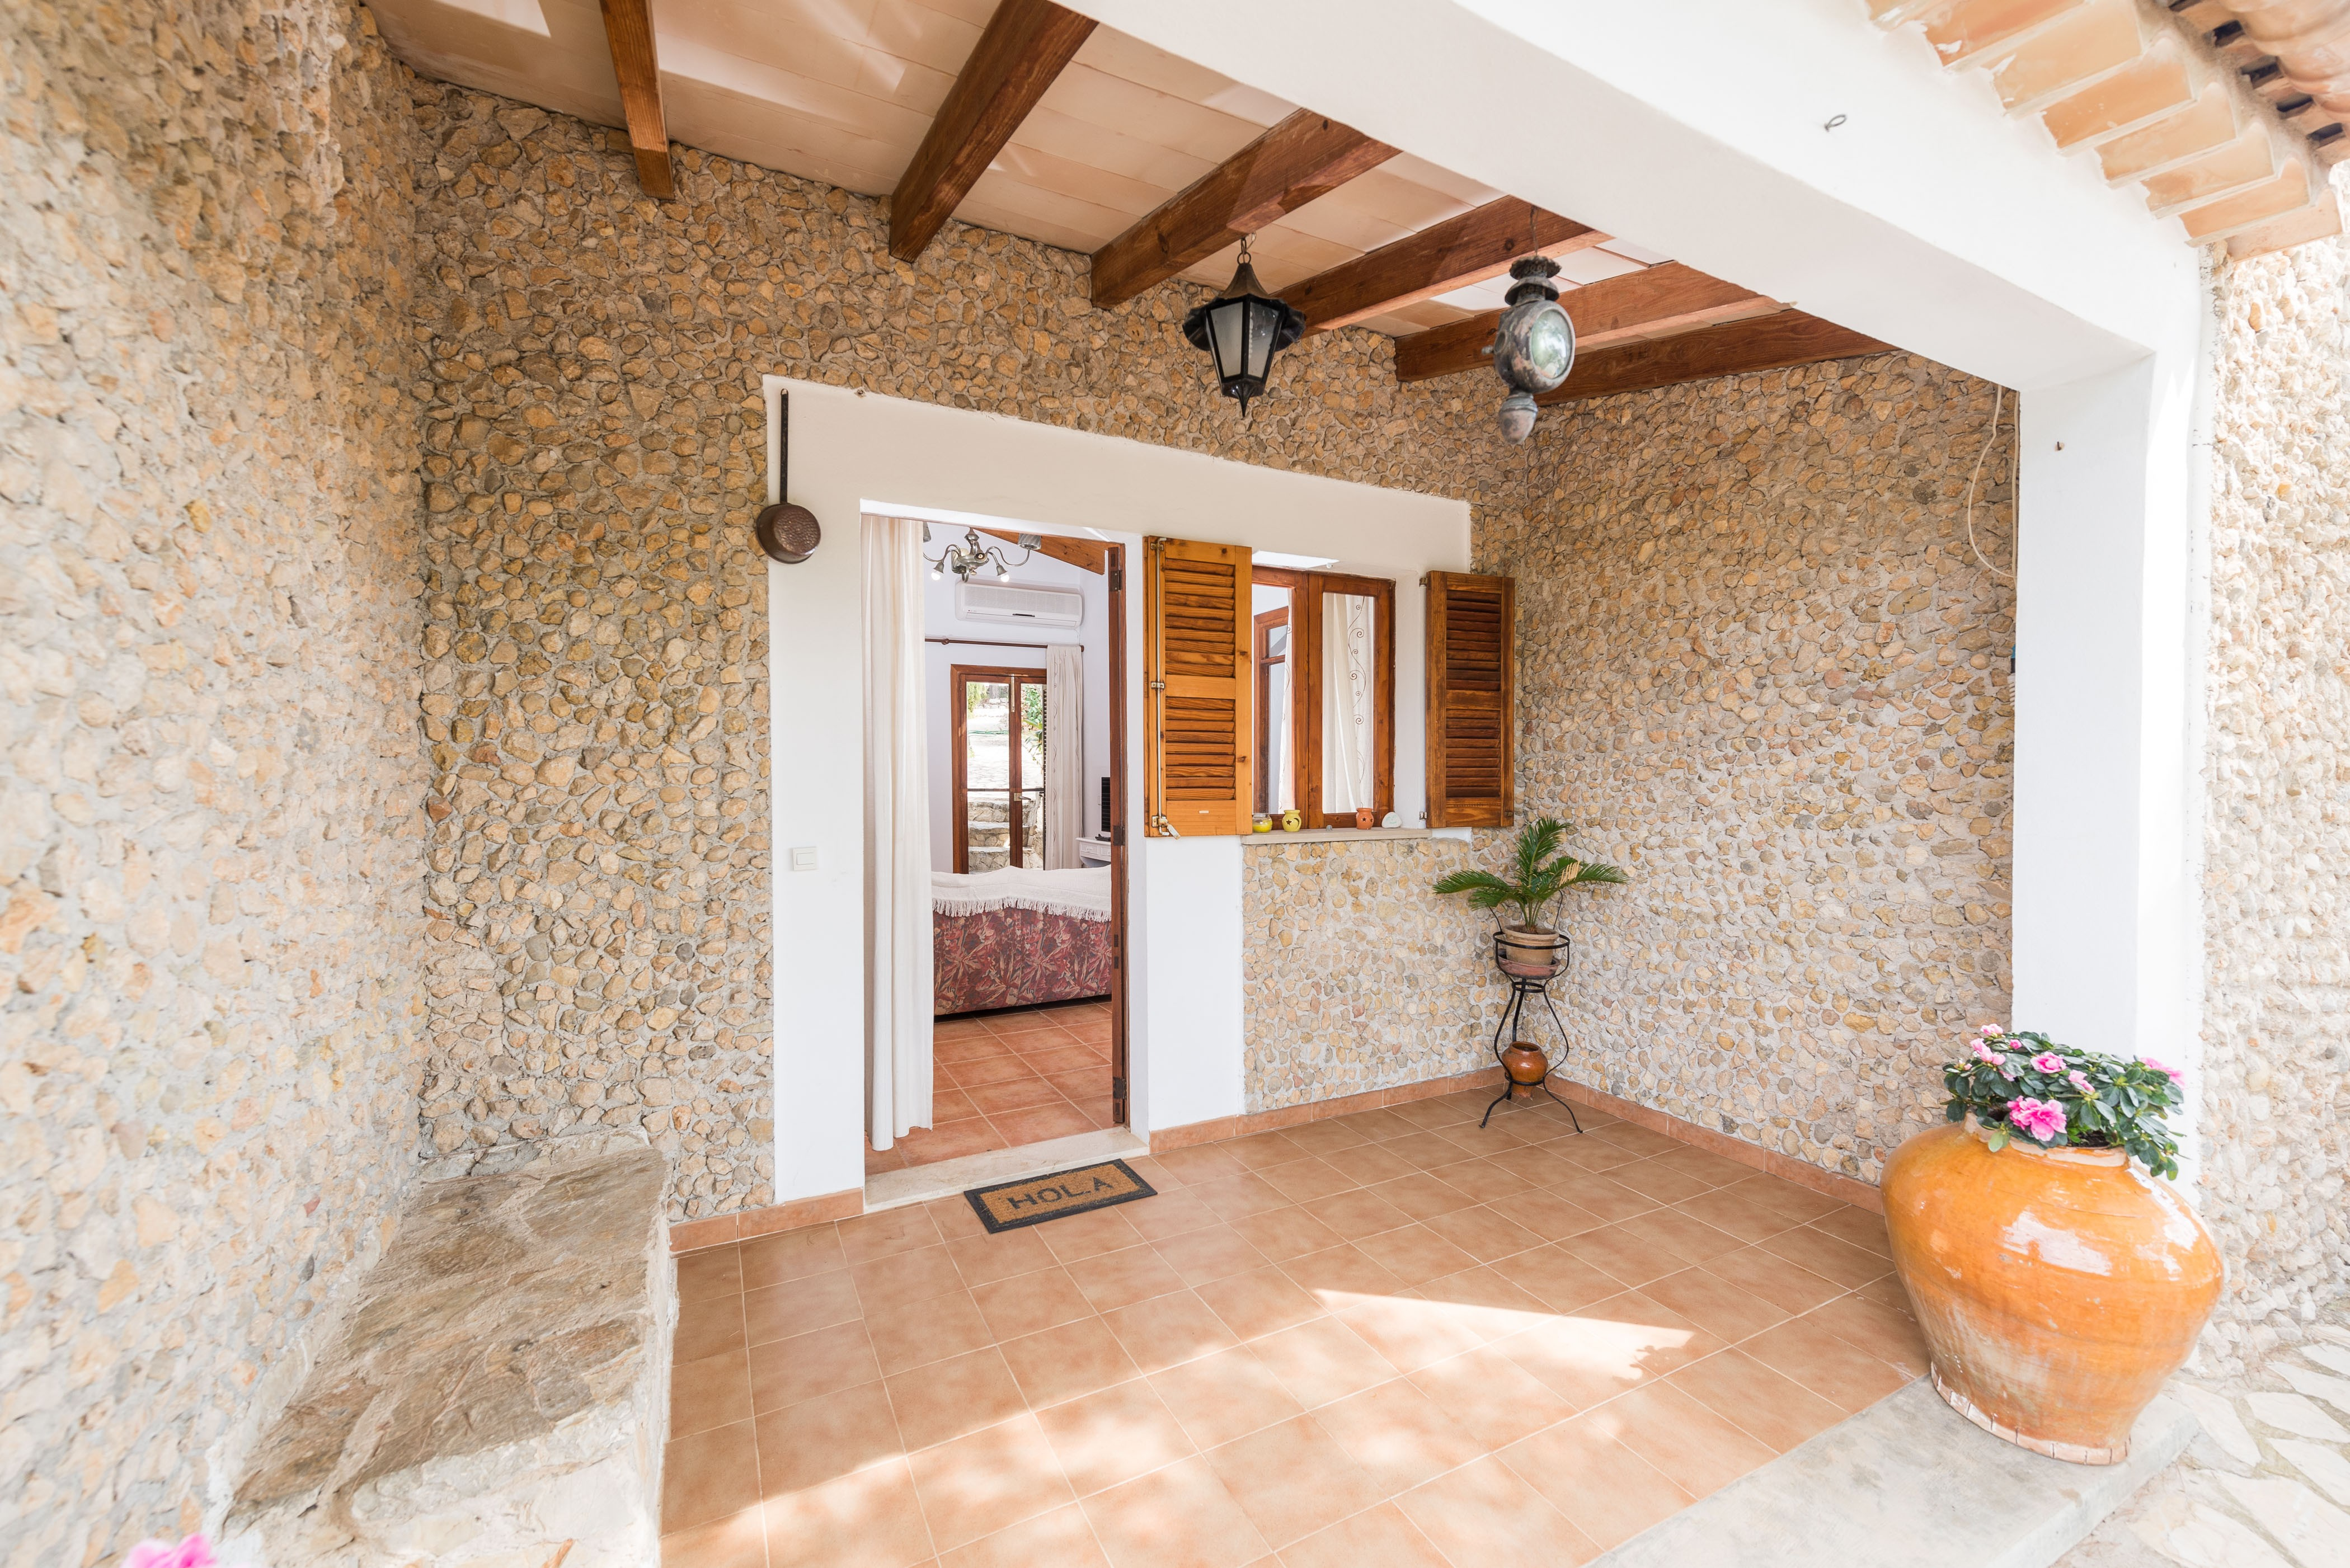 Ferienhaus SON DURINET (2302802), Mancor de la Vall, Mallorca, Balearische Inseln, Spanien, Bild 27